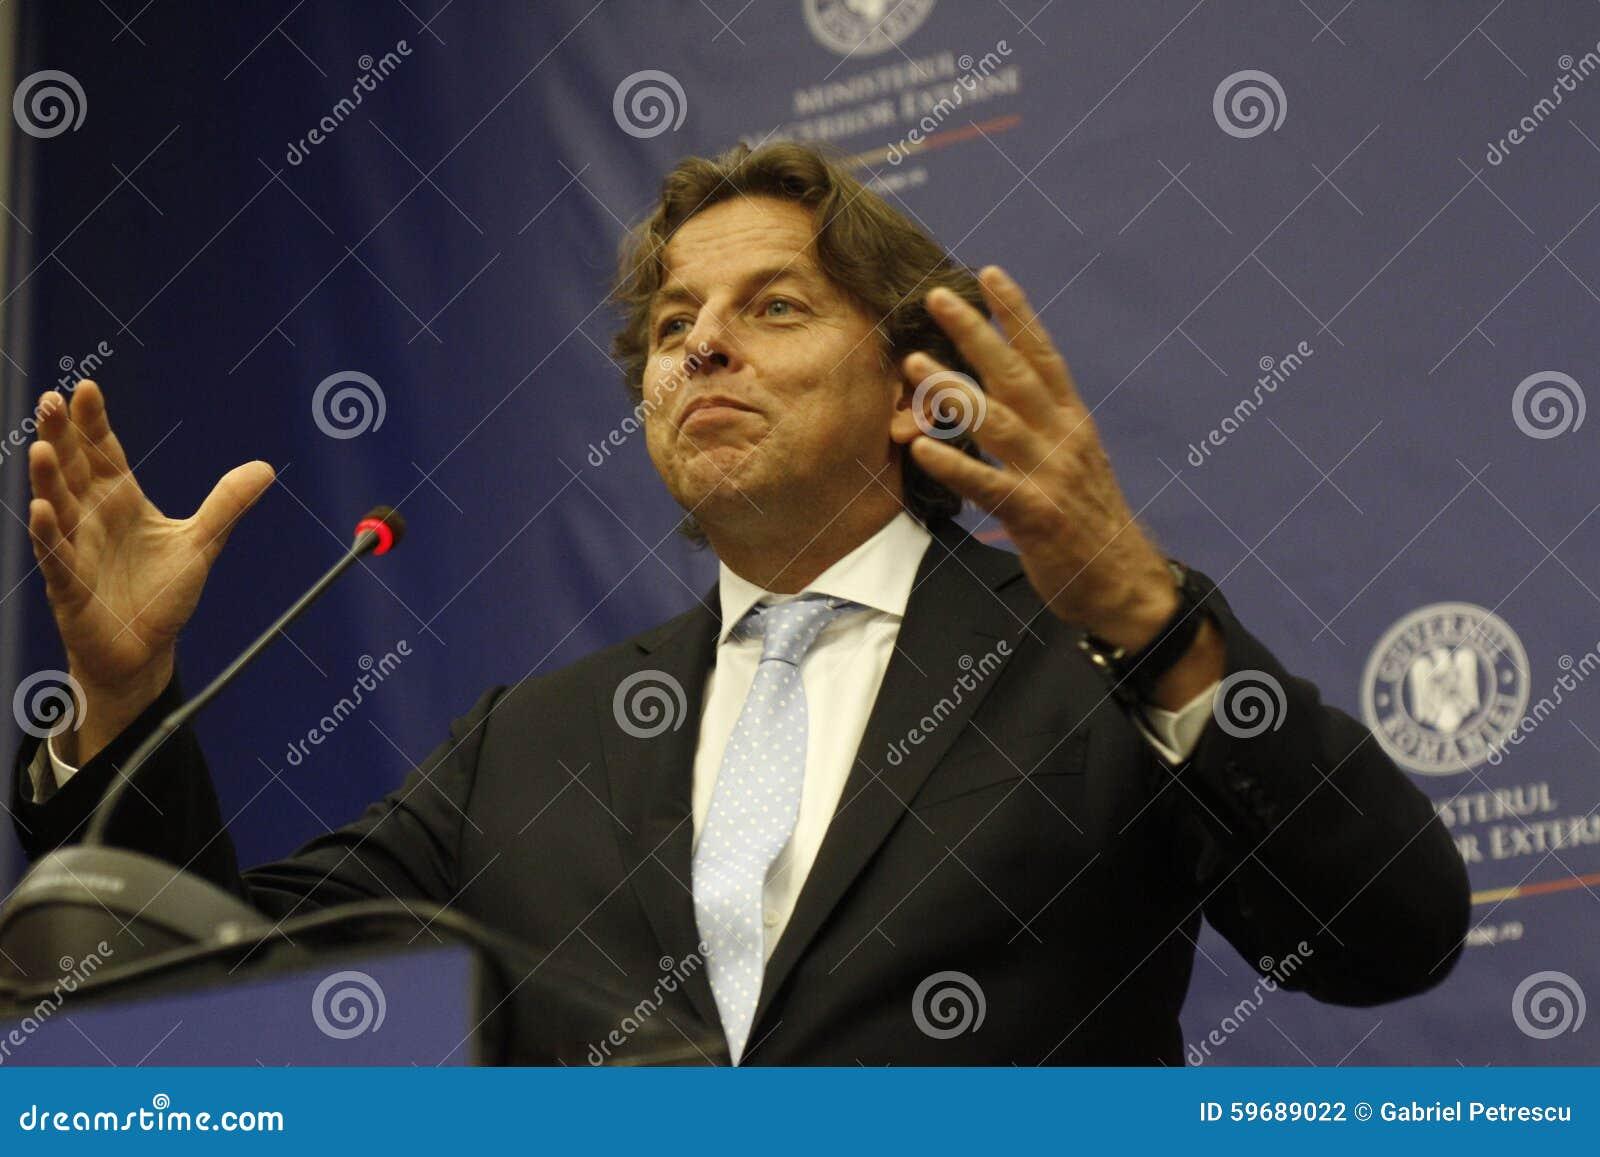 Romanian Foreign Affairs Minister Bogdan Aurescu consultations with visiting Dutch counterpart Bert Koenders